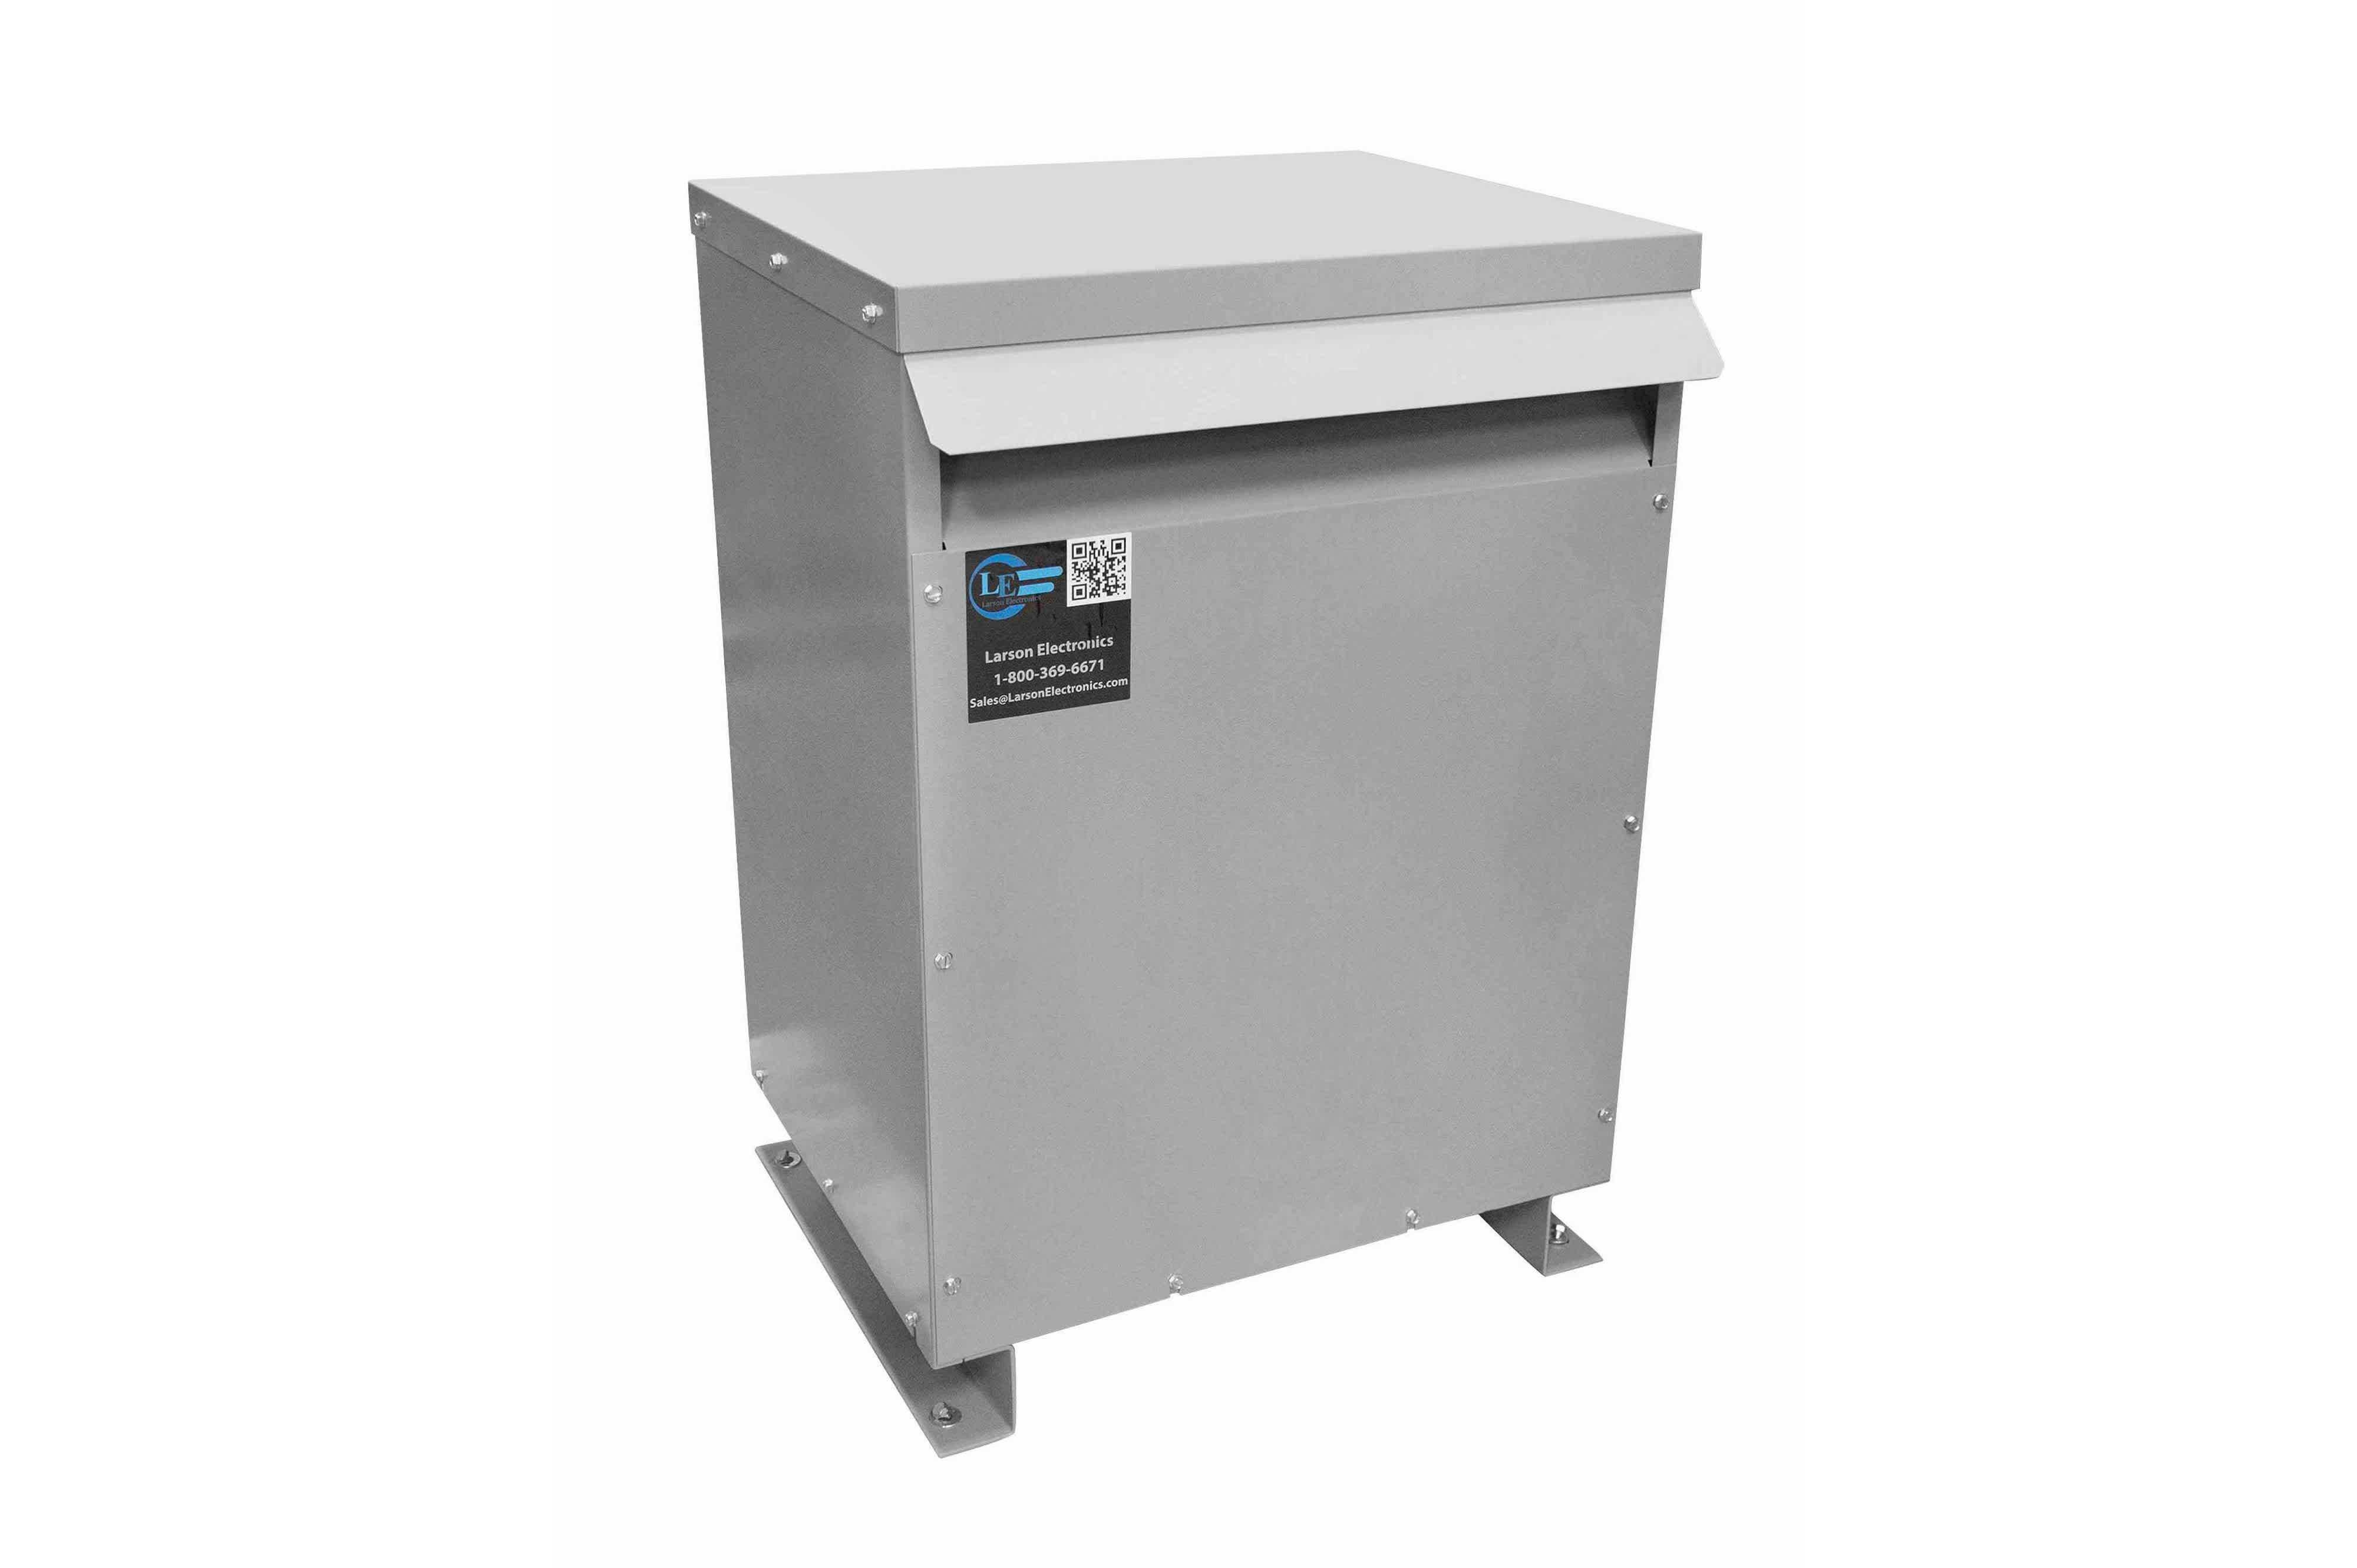 150 kVA 3PH DOE Transformer, 400V Delta Primary, 480Y/277 Wye-N Secondary, N3R, Ventilated, 60 Hz